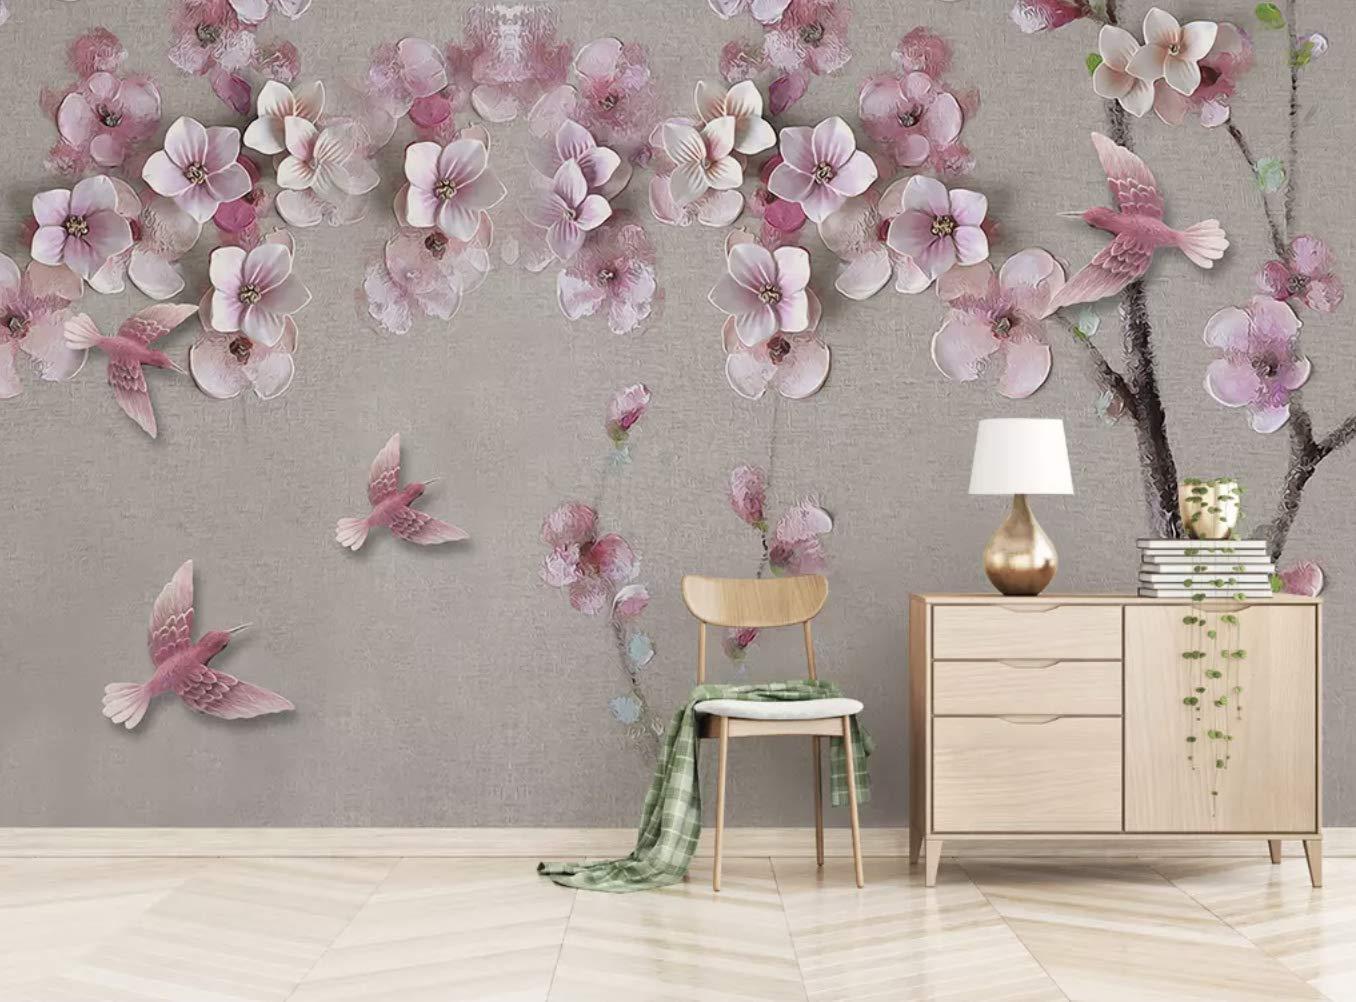 Amazon Com Murwall Floral Wallpaper 3d Cherry Blossom Wall Mural